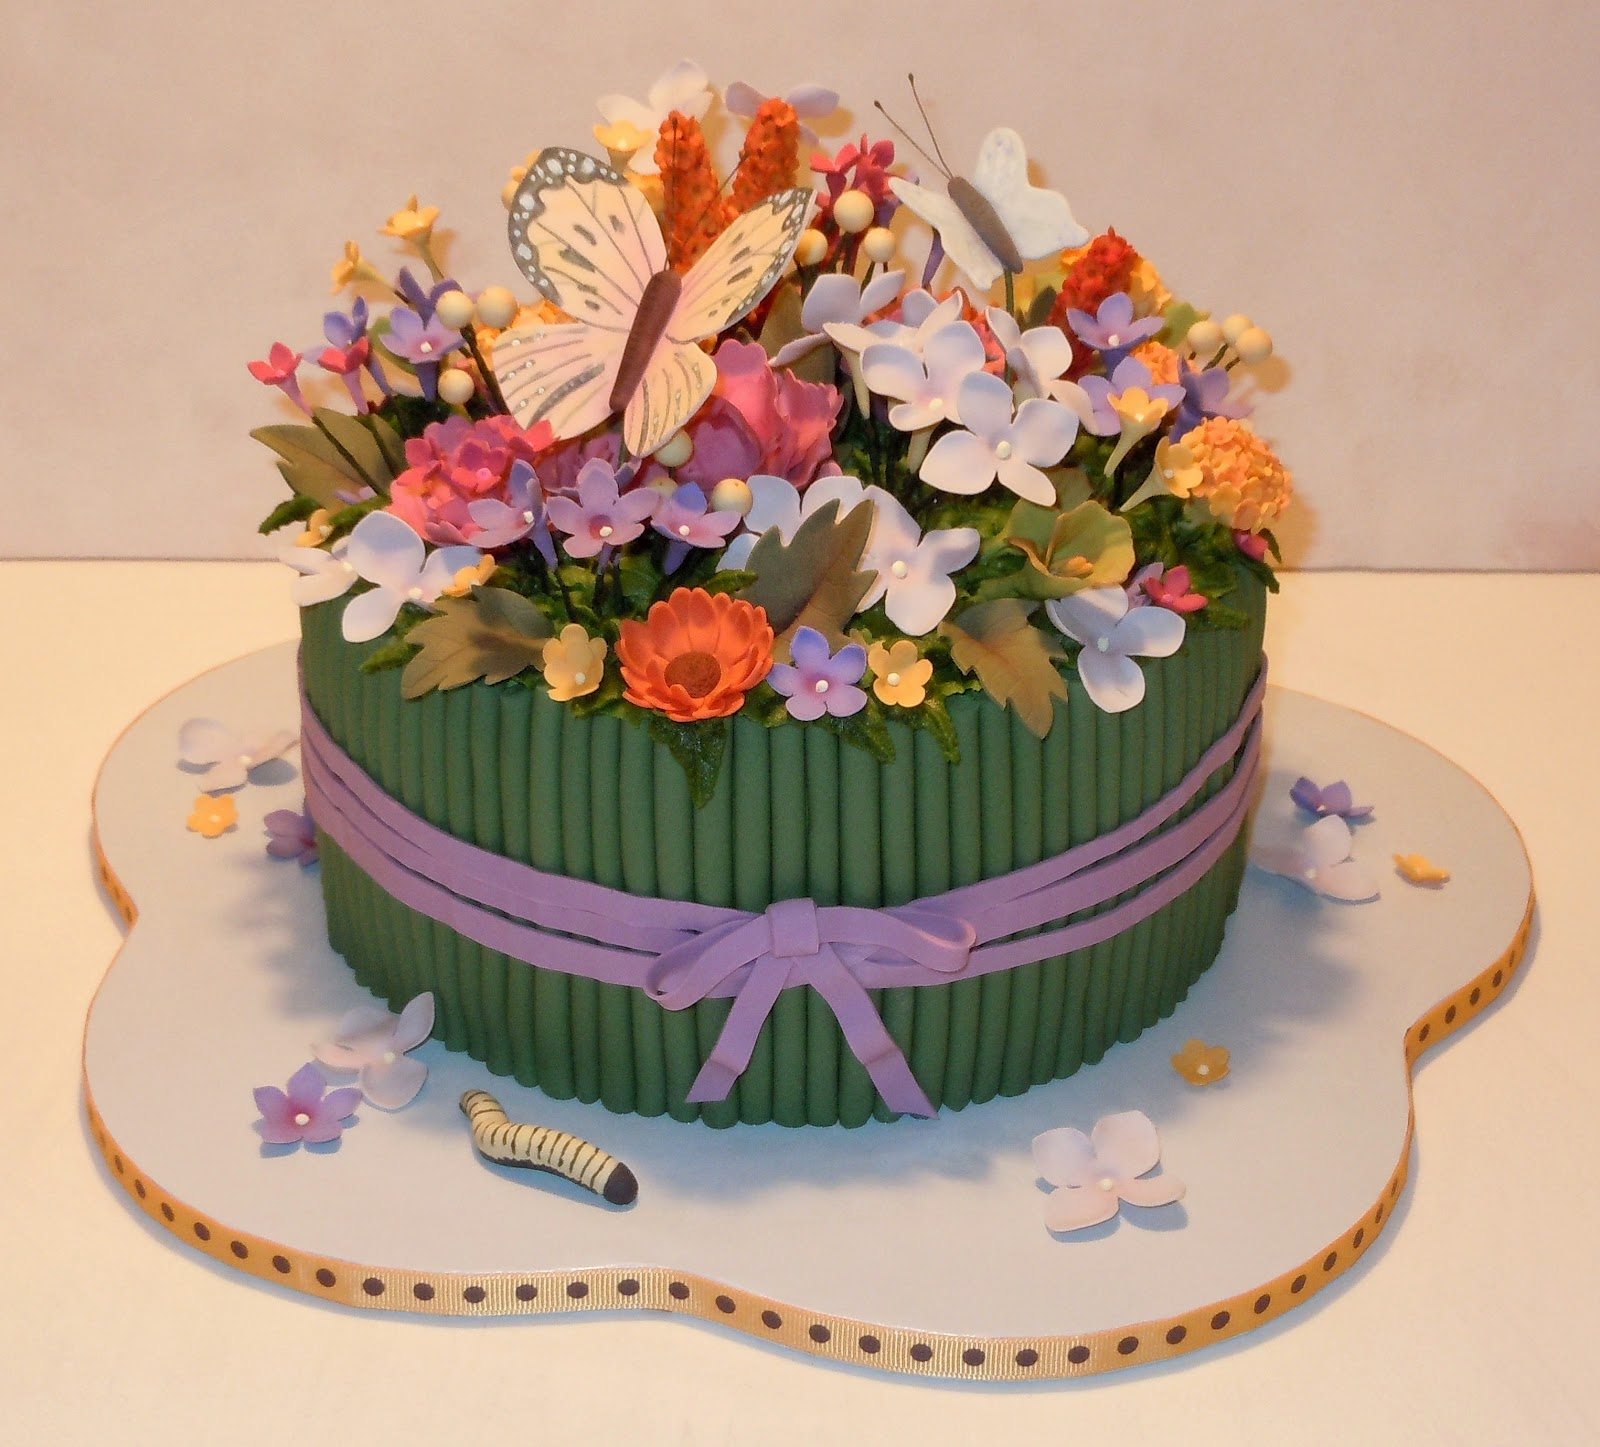 Flower birthday cakes flower cake beautiful flowers izmirmasajfo